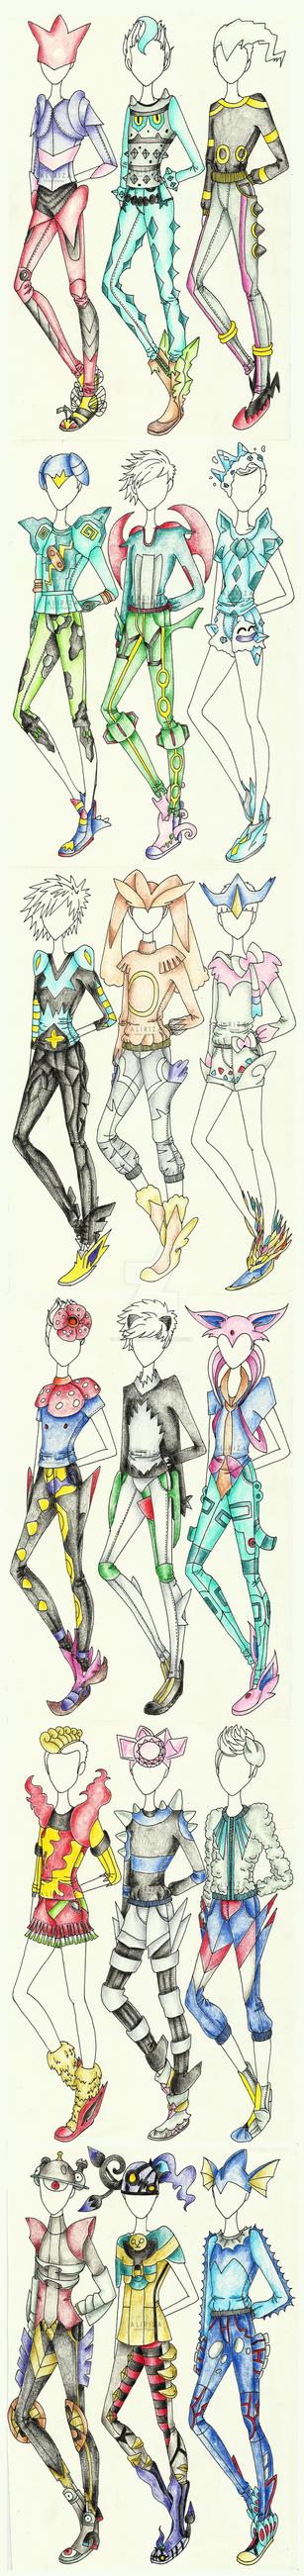 Pokemon Men Couture by AlirizaDesign